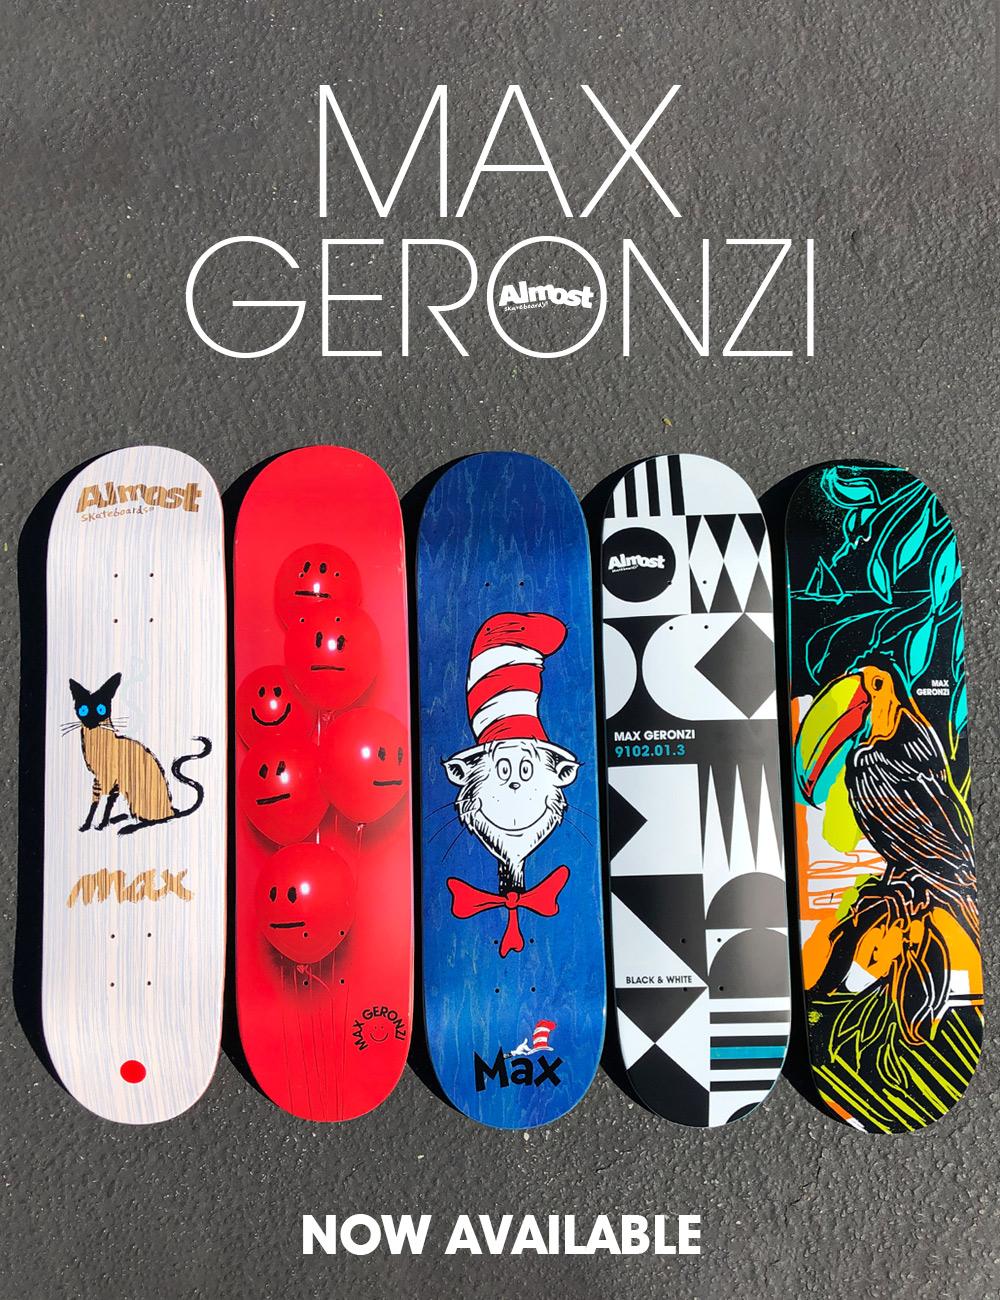 Almost_Skateboards_Max_Geronzi_Pro_Decks_available.jpg